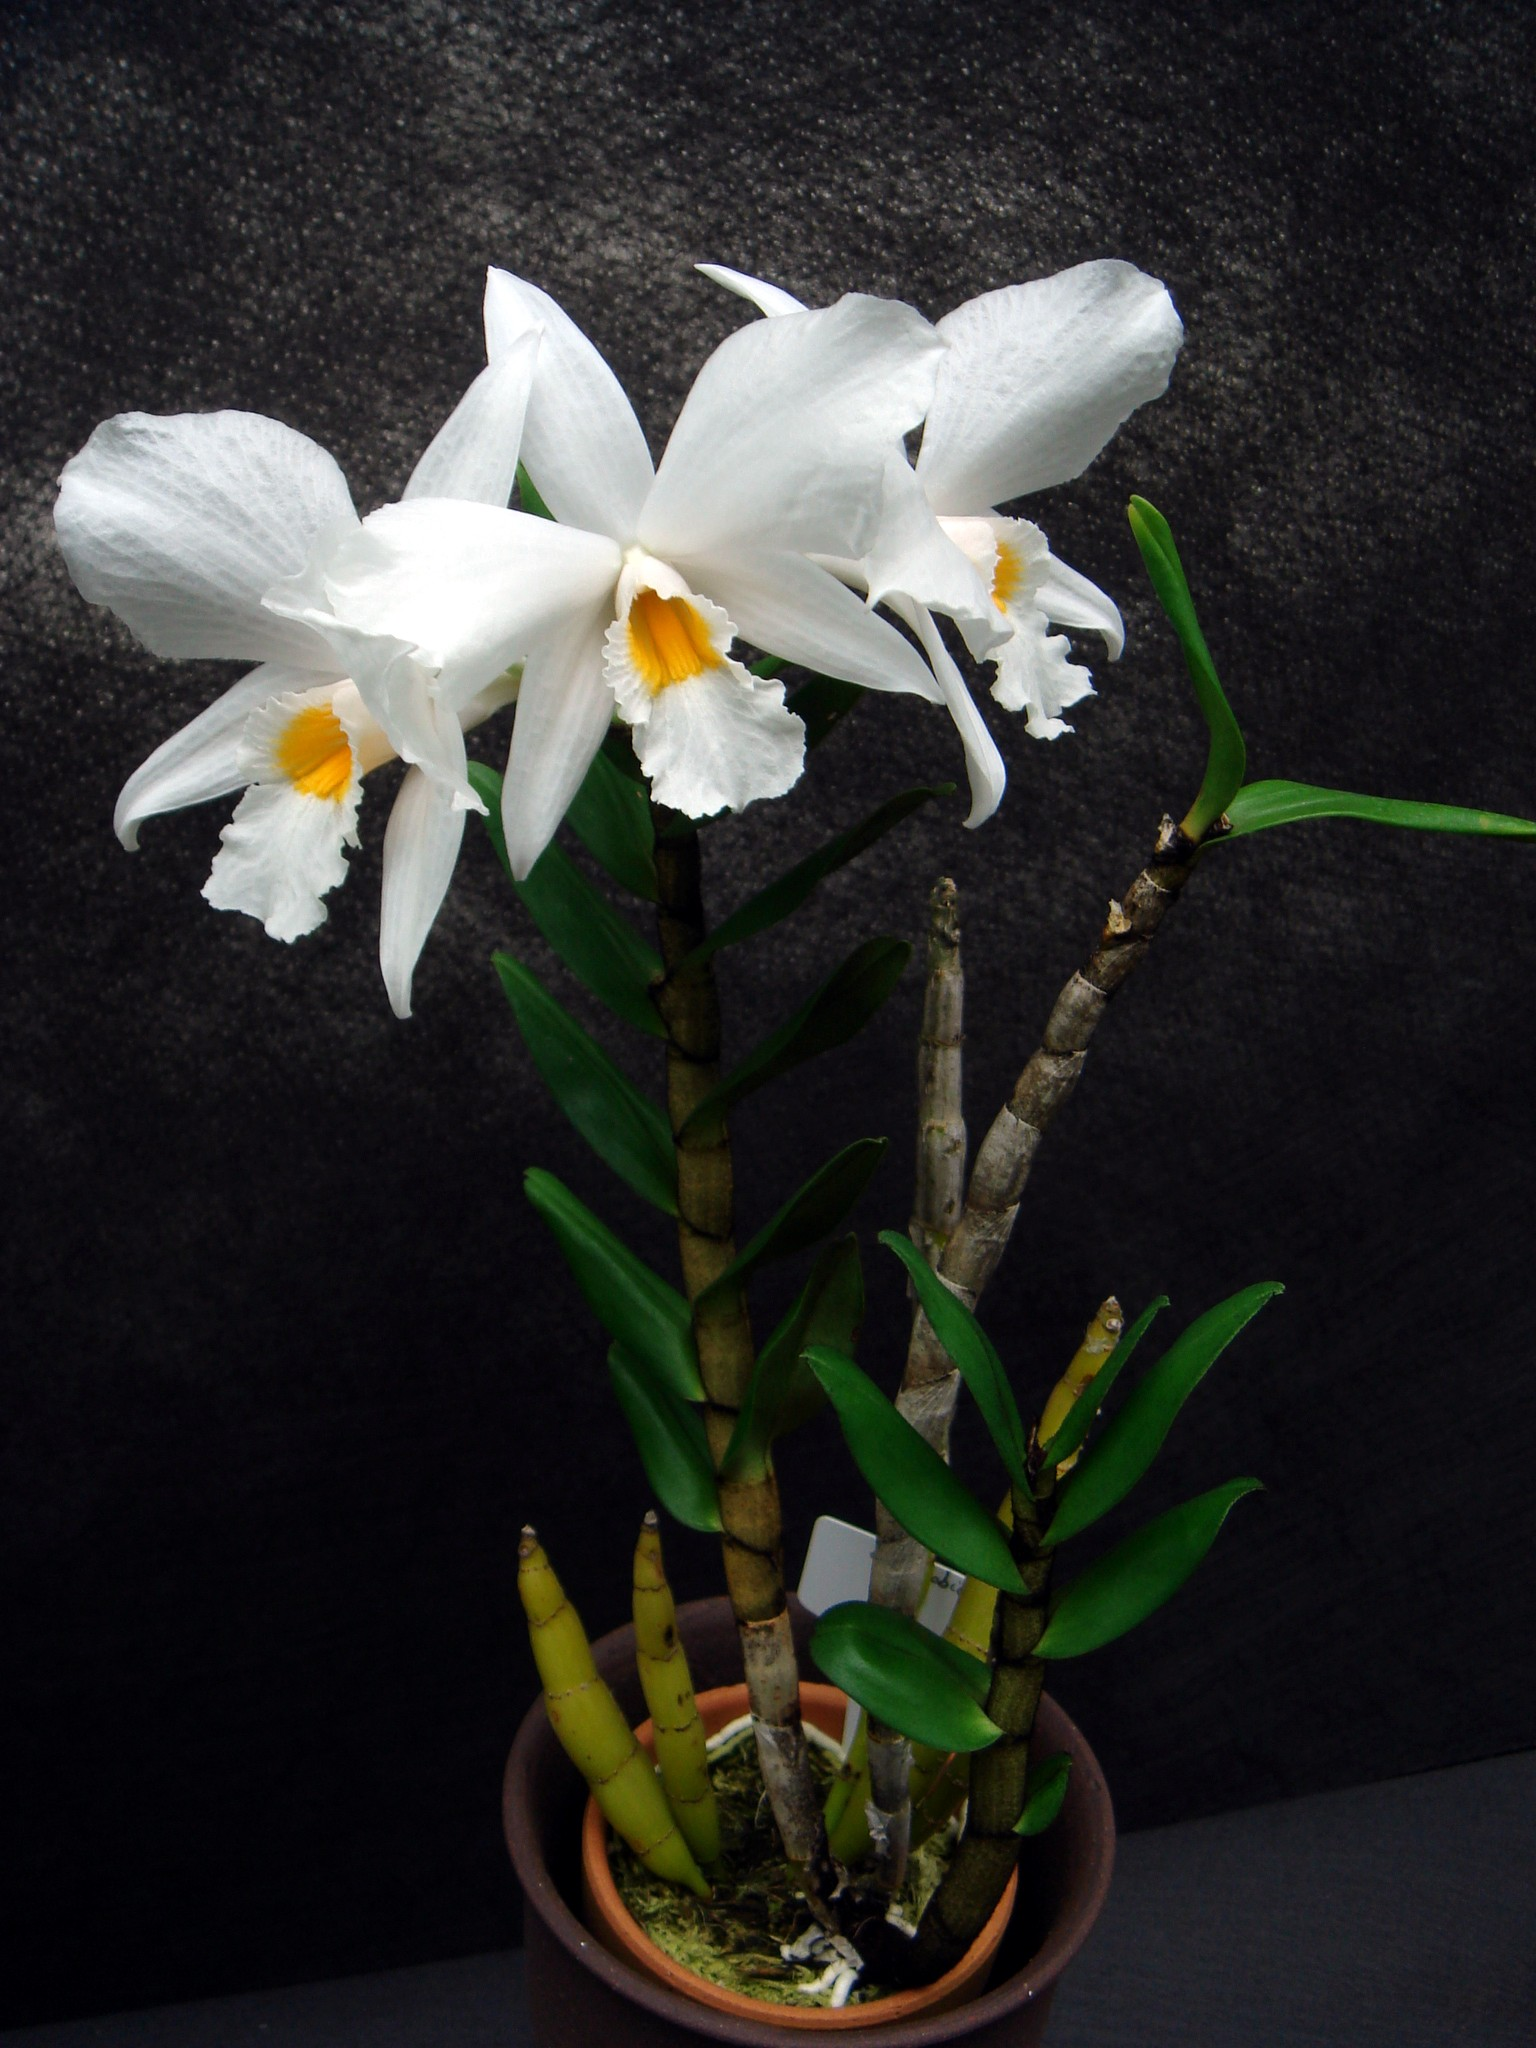 http://orchids.la.coocan.jp/Dendrobium/Dendrobium%20infundibulum/DSC01302.JPG